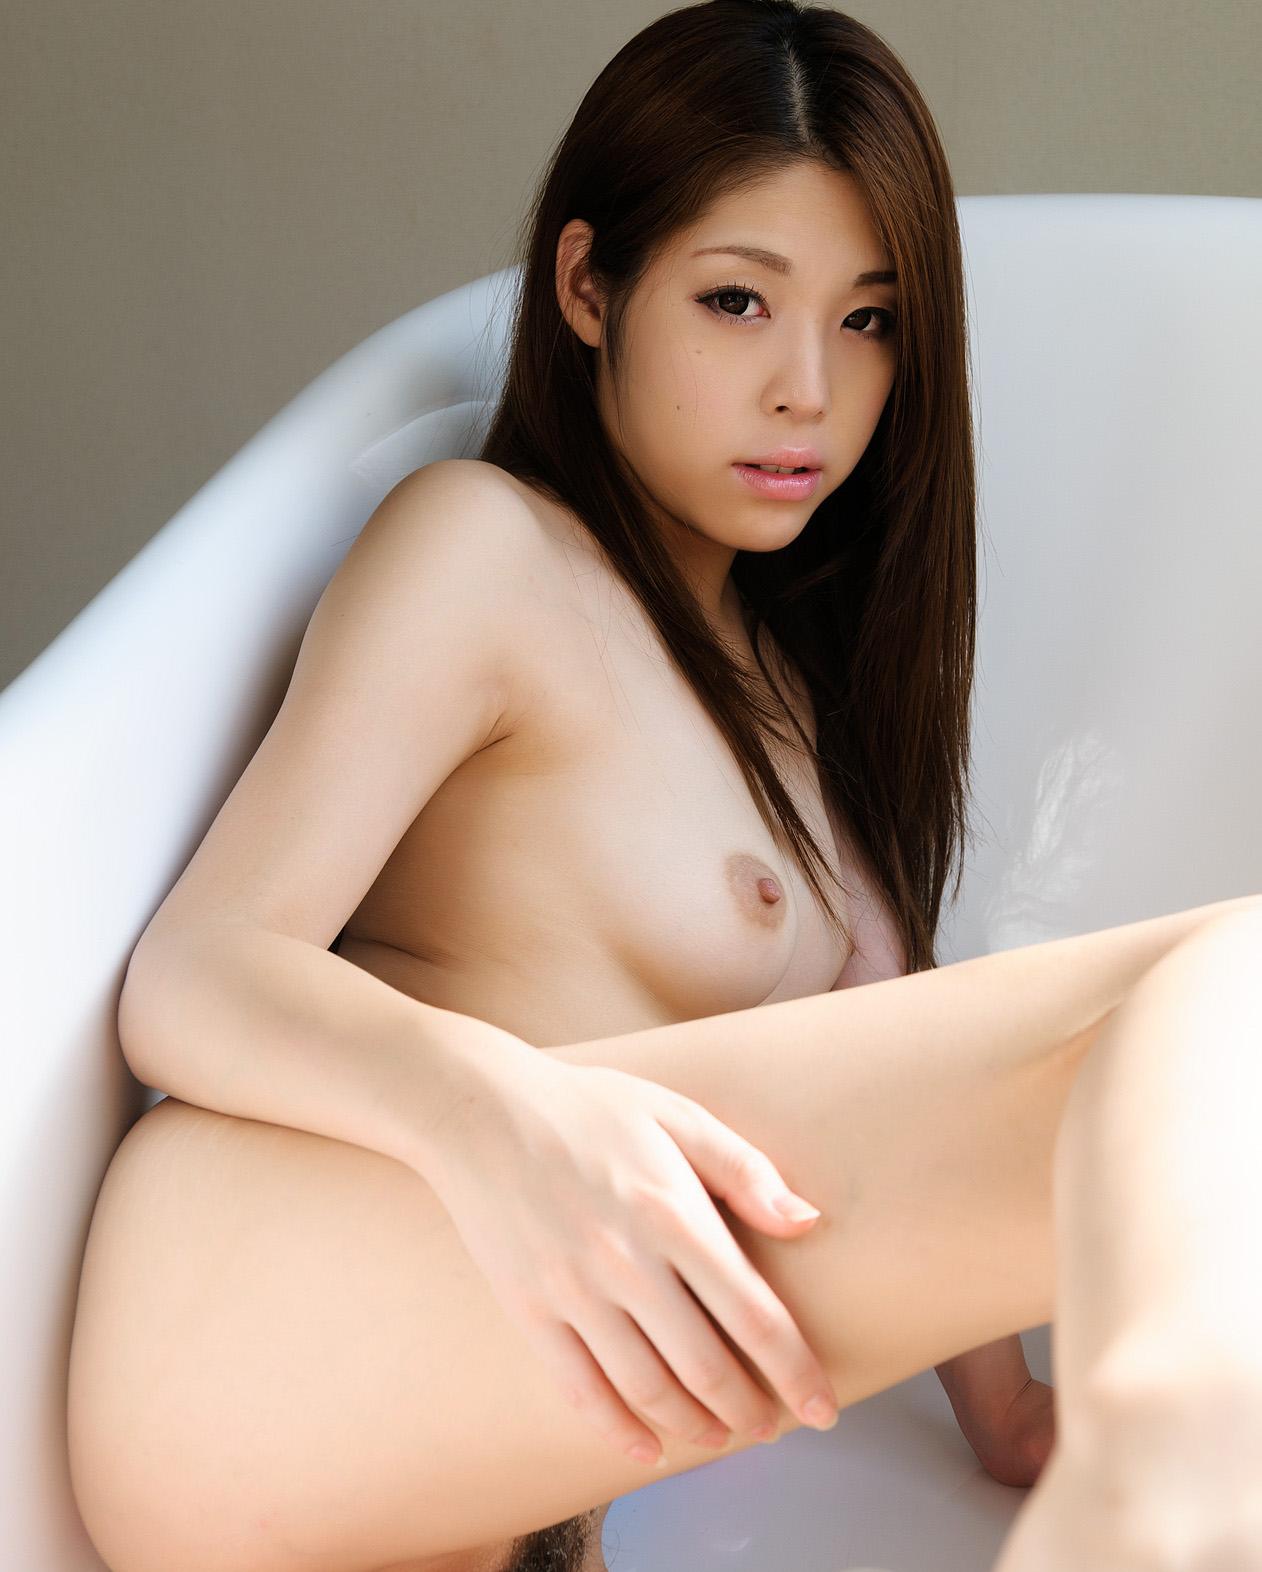 Korean Pussy Pics, Hd Korean Pussy Galleries